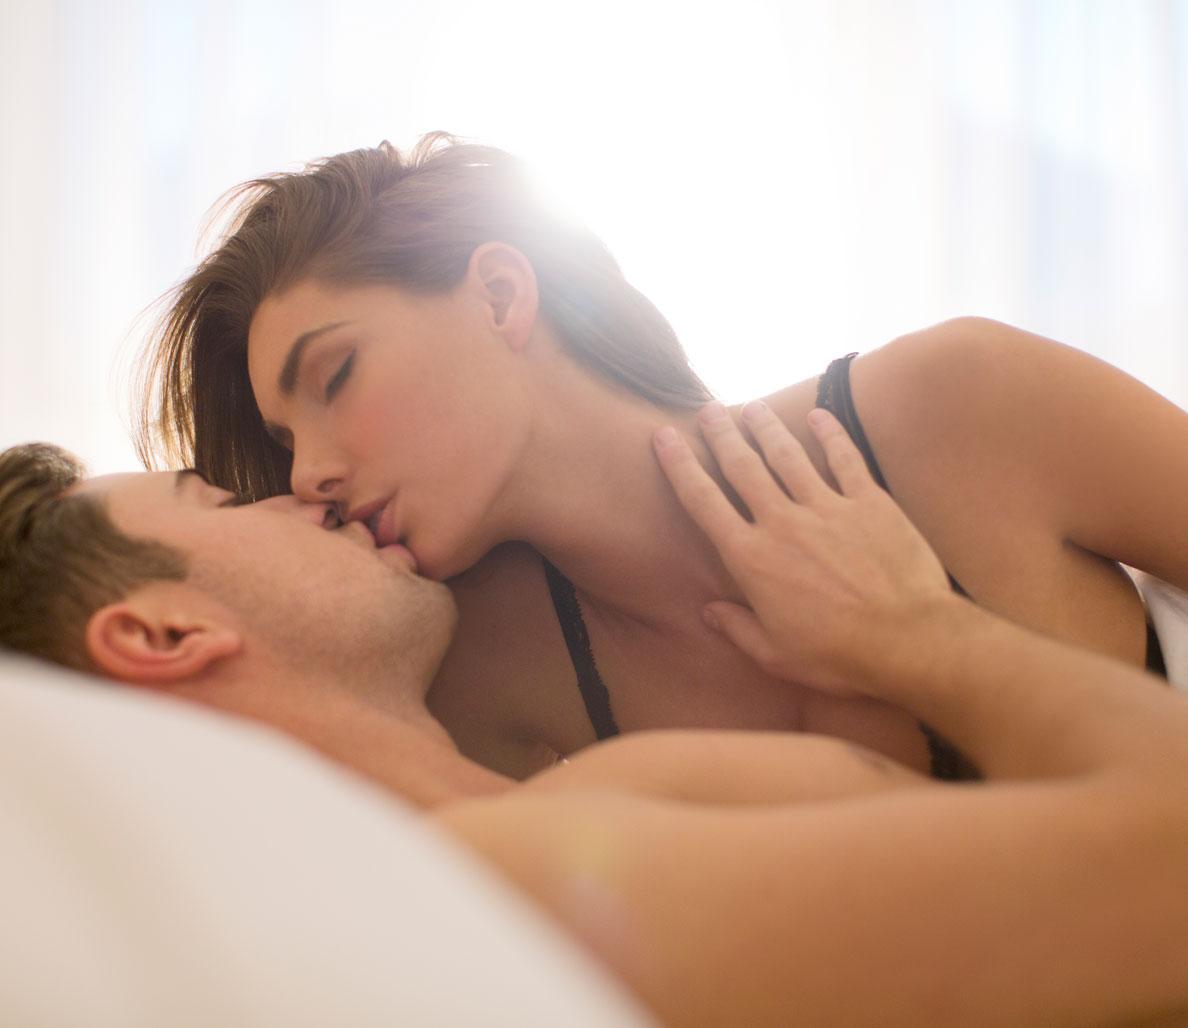 lowlibidoinmen erectiledysfunctionremedies erectiledysfunctioncures impotence erectiledysfunction libido lowlibido cantgetitup erection maleimpotence malemenopause prostate